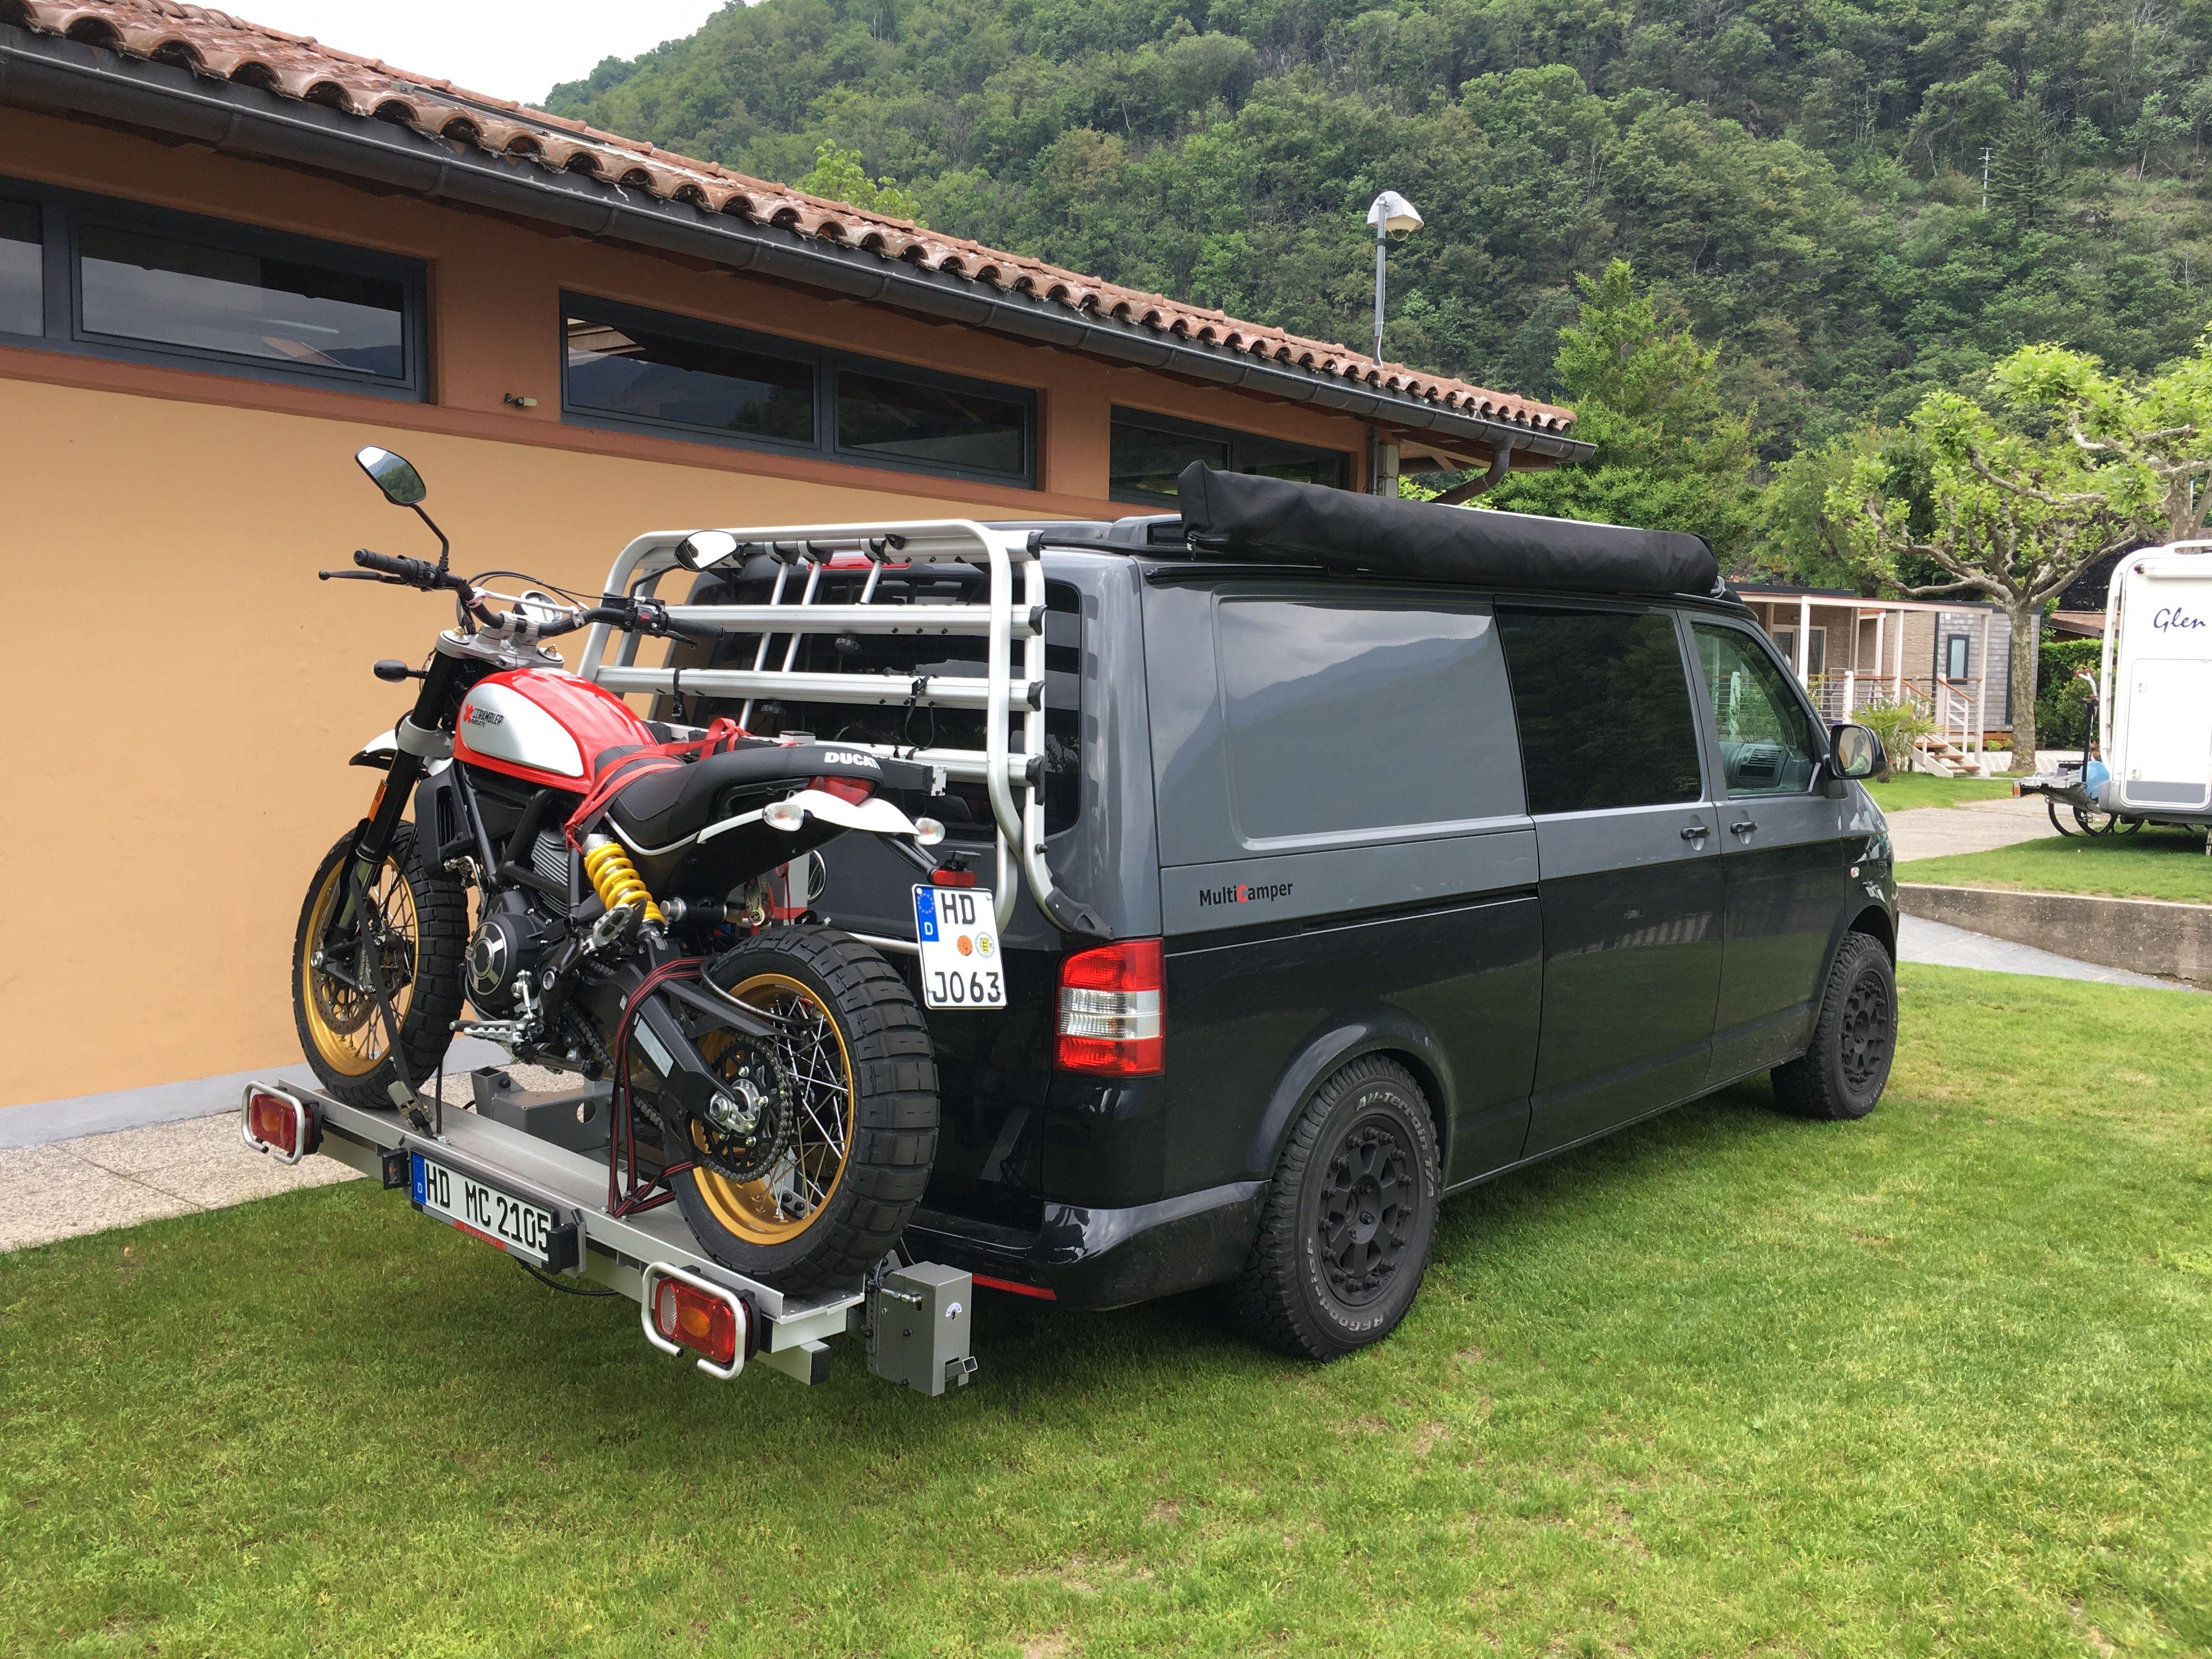 Wohnmobil Mit Motorrad